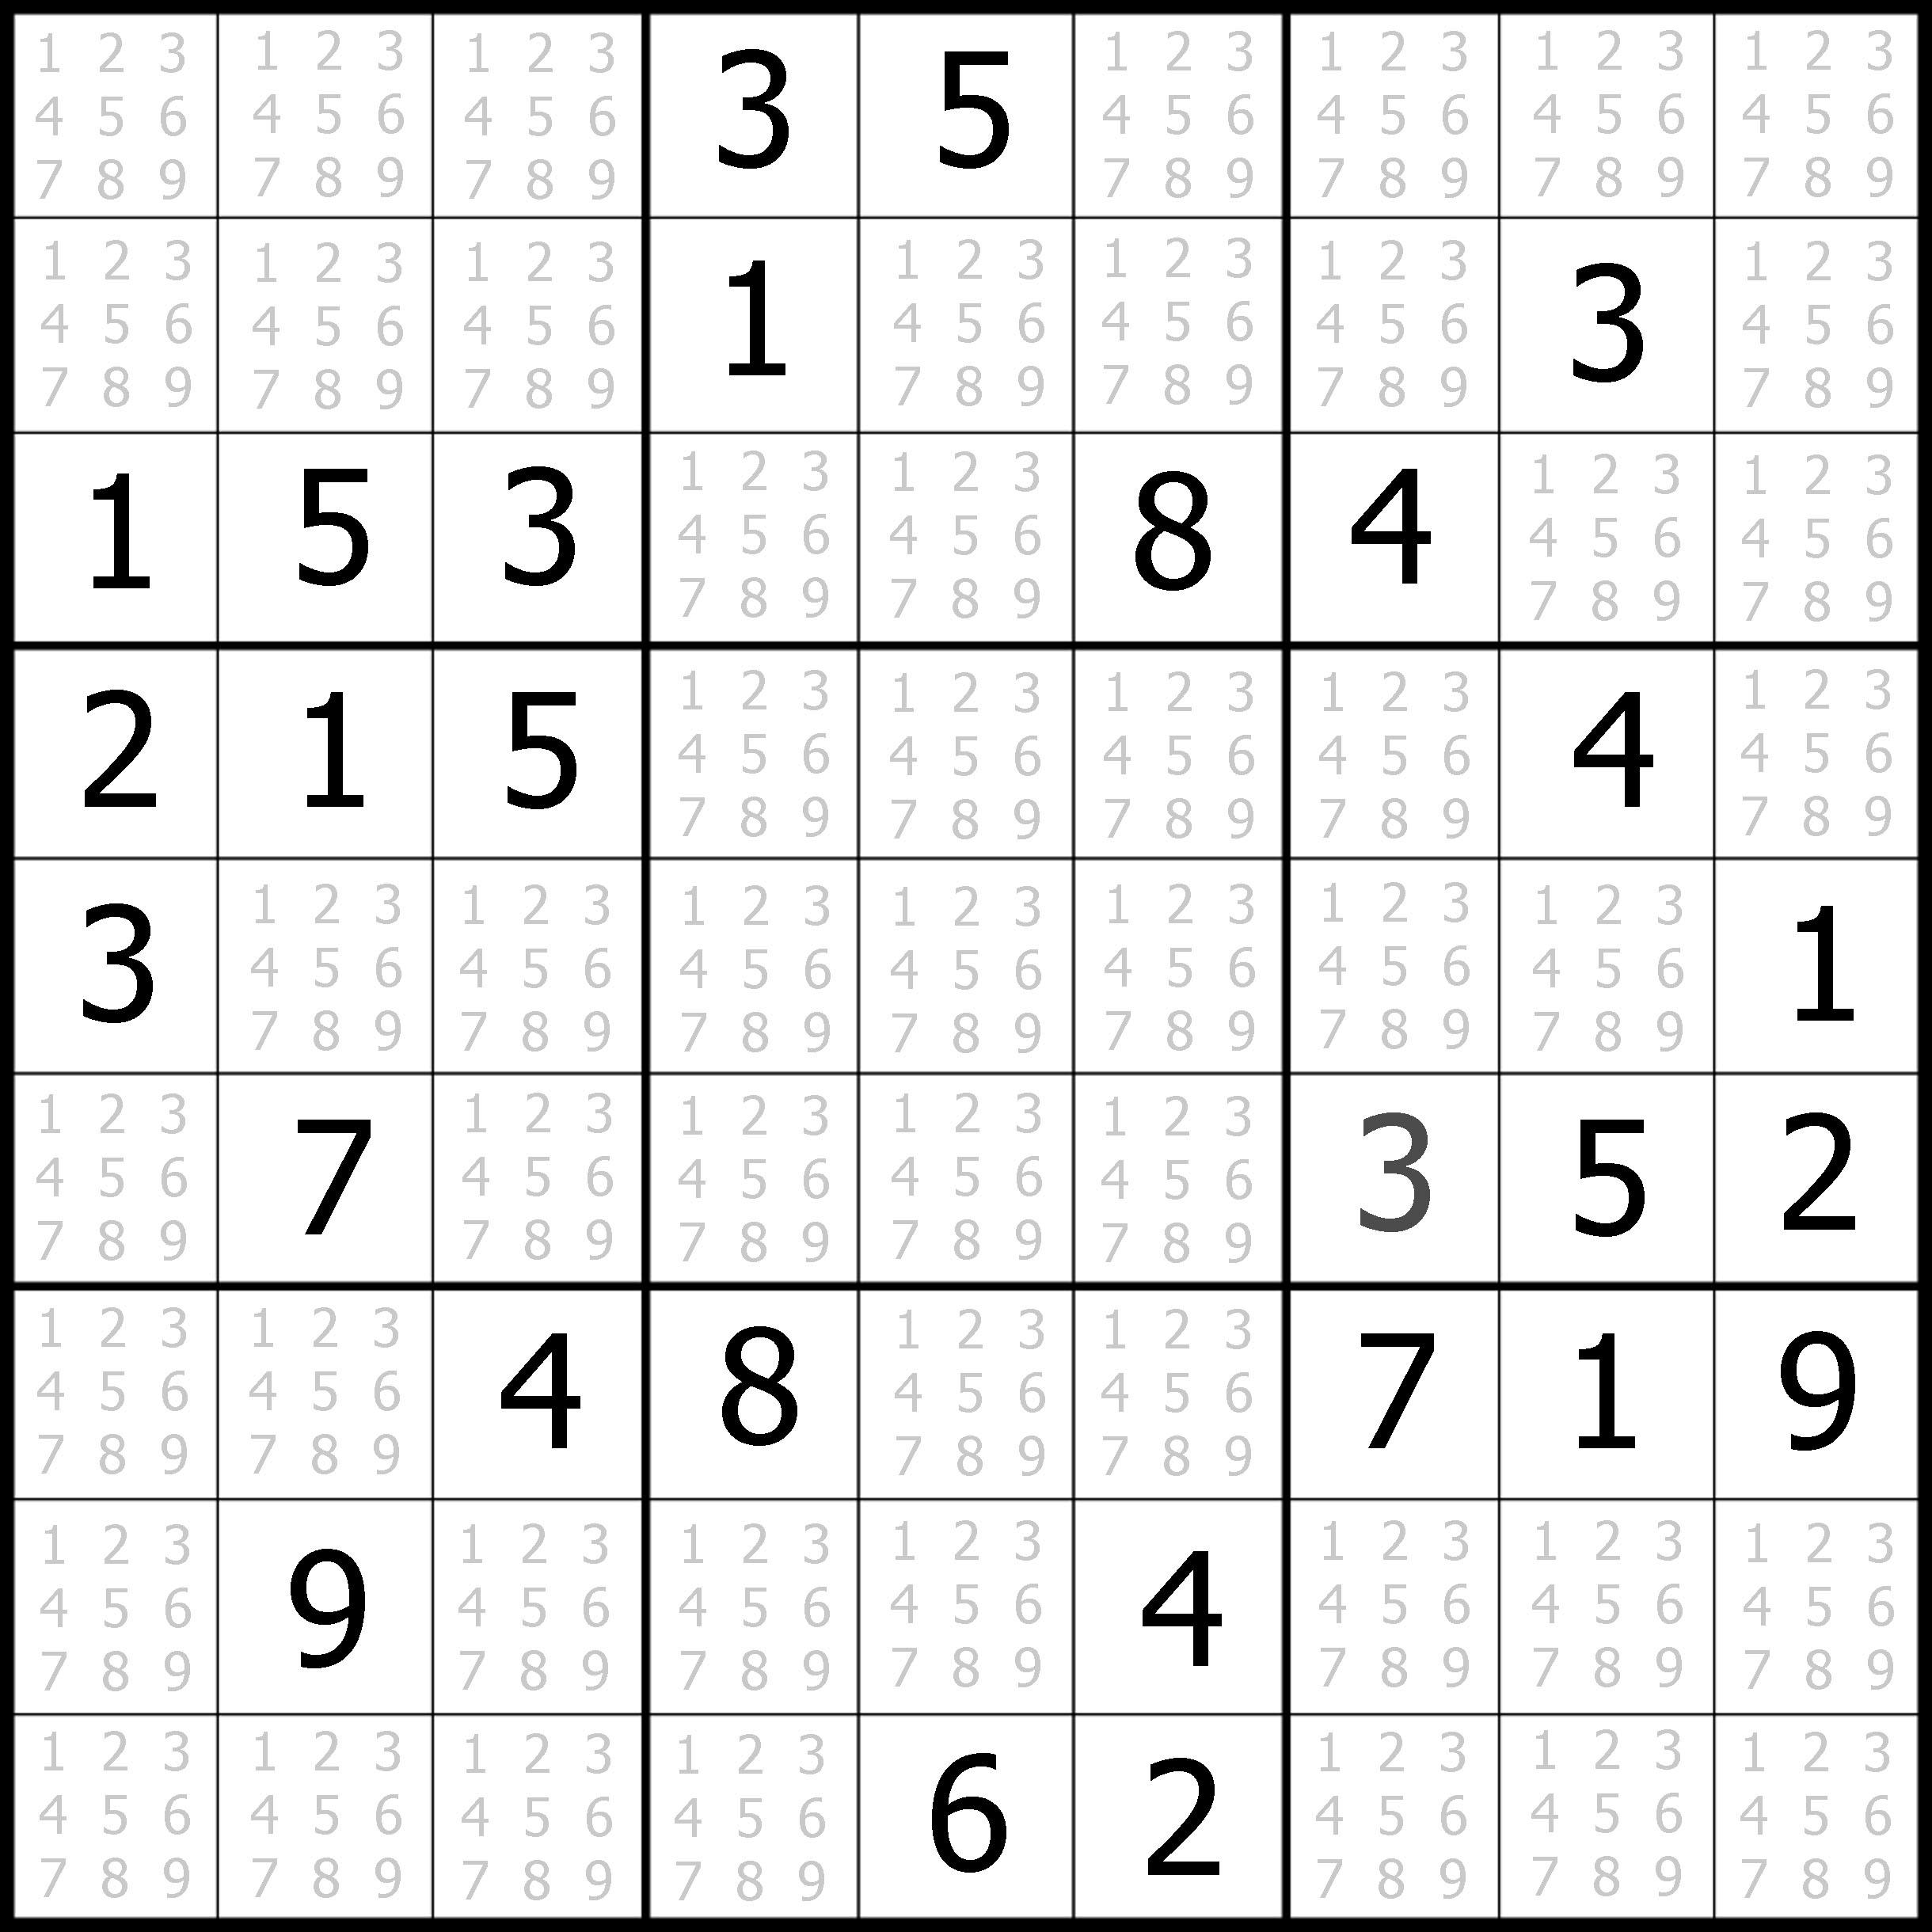 Free Easy Sudoku Puzzle #04 | Sudoku Puzzler - Free Printable Sudoku Easy